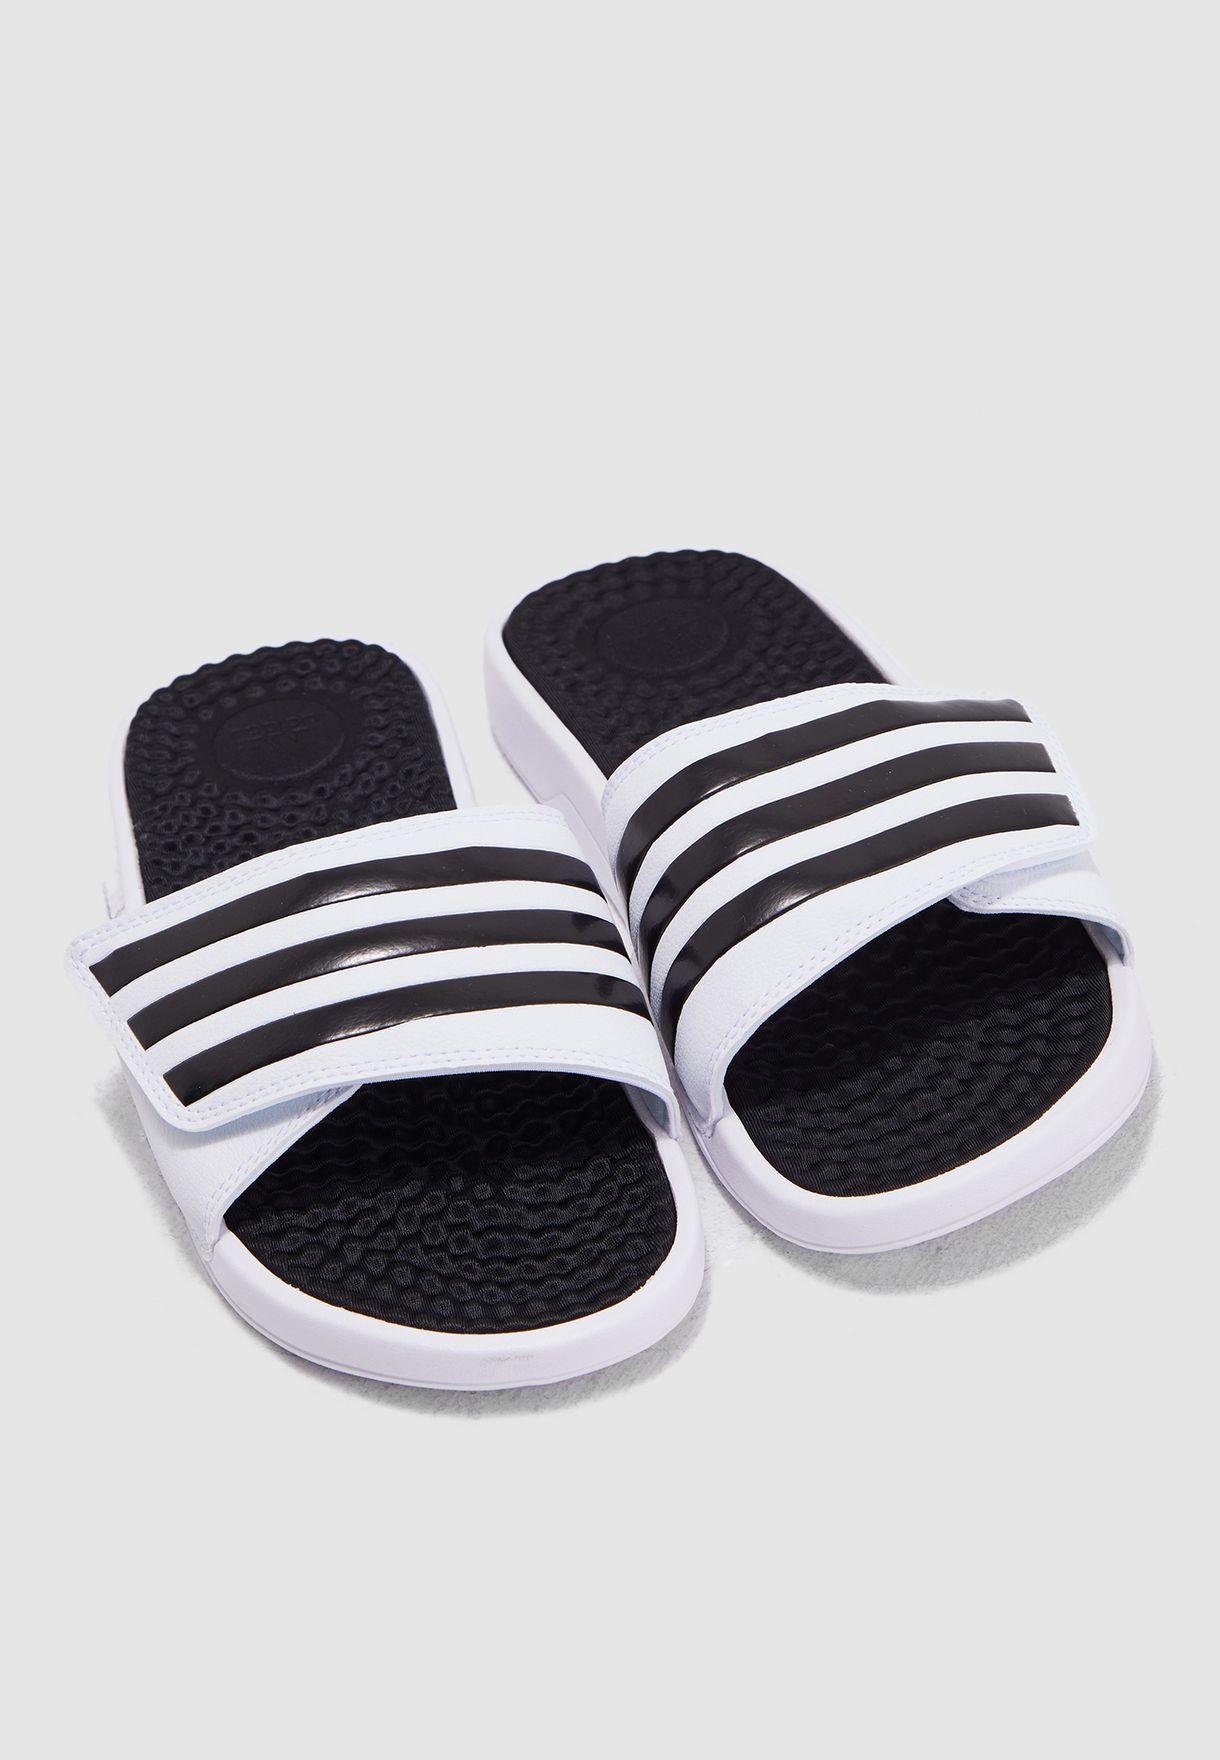 4da695848f1d Shop adidas monochrome Adissage TND Slides F35563 for Men in UAE -  14448SH98BIP